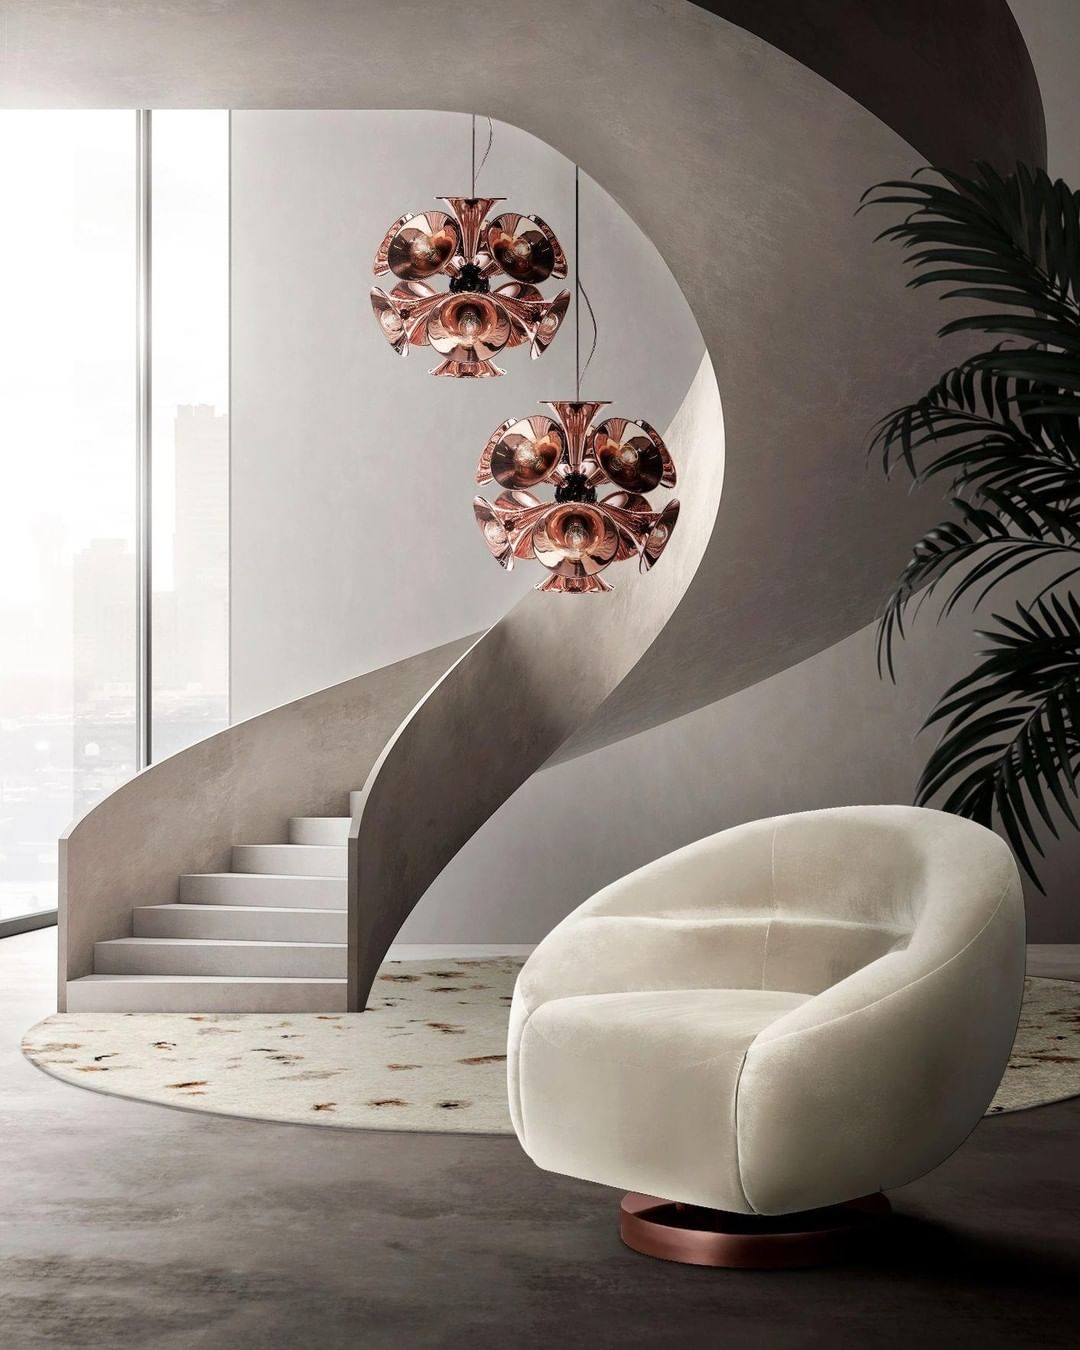 Hallways and Entryways , hallways, entryways, home design, design, furniture home inspiration ideas